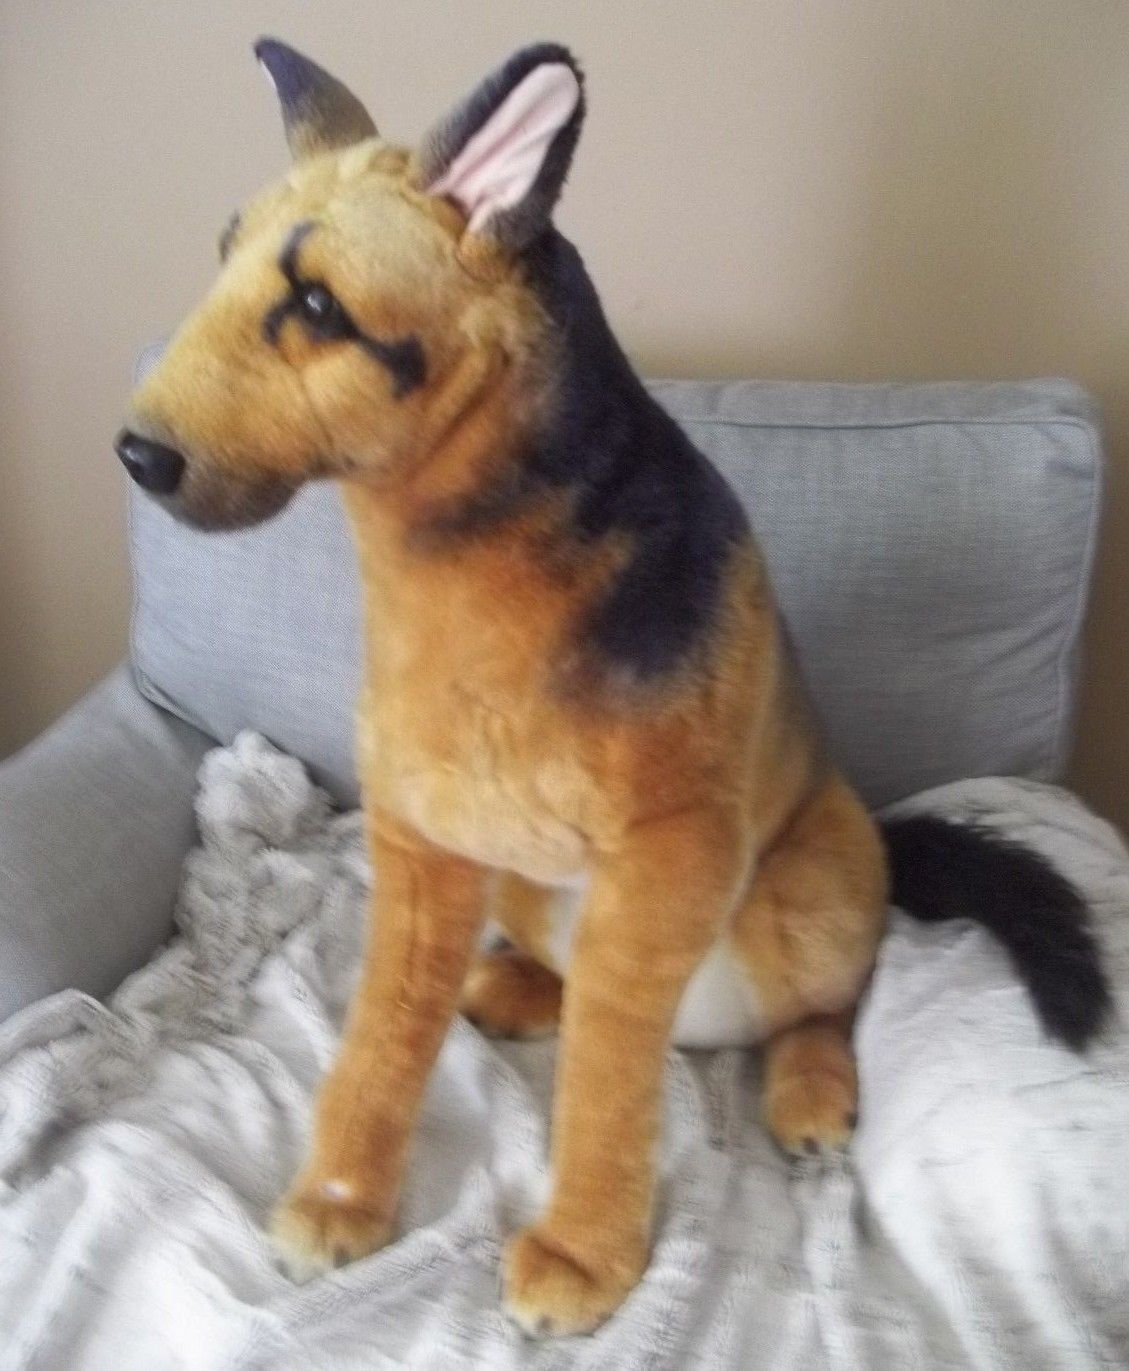 3 German Shepherd Life Size Realistic Plush Stuffed Animal Toy